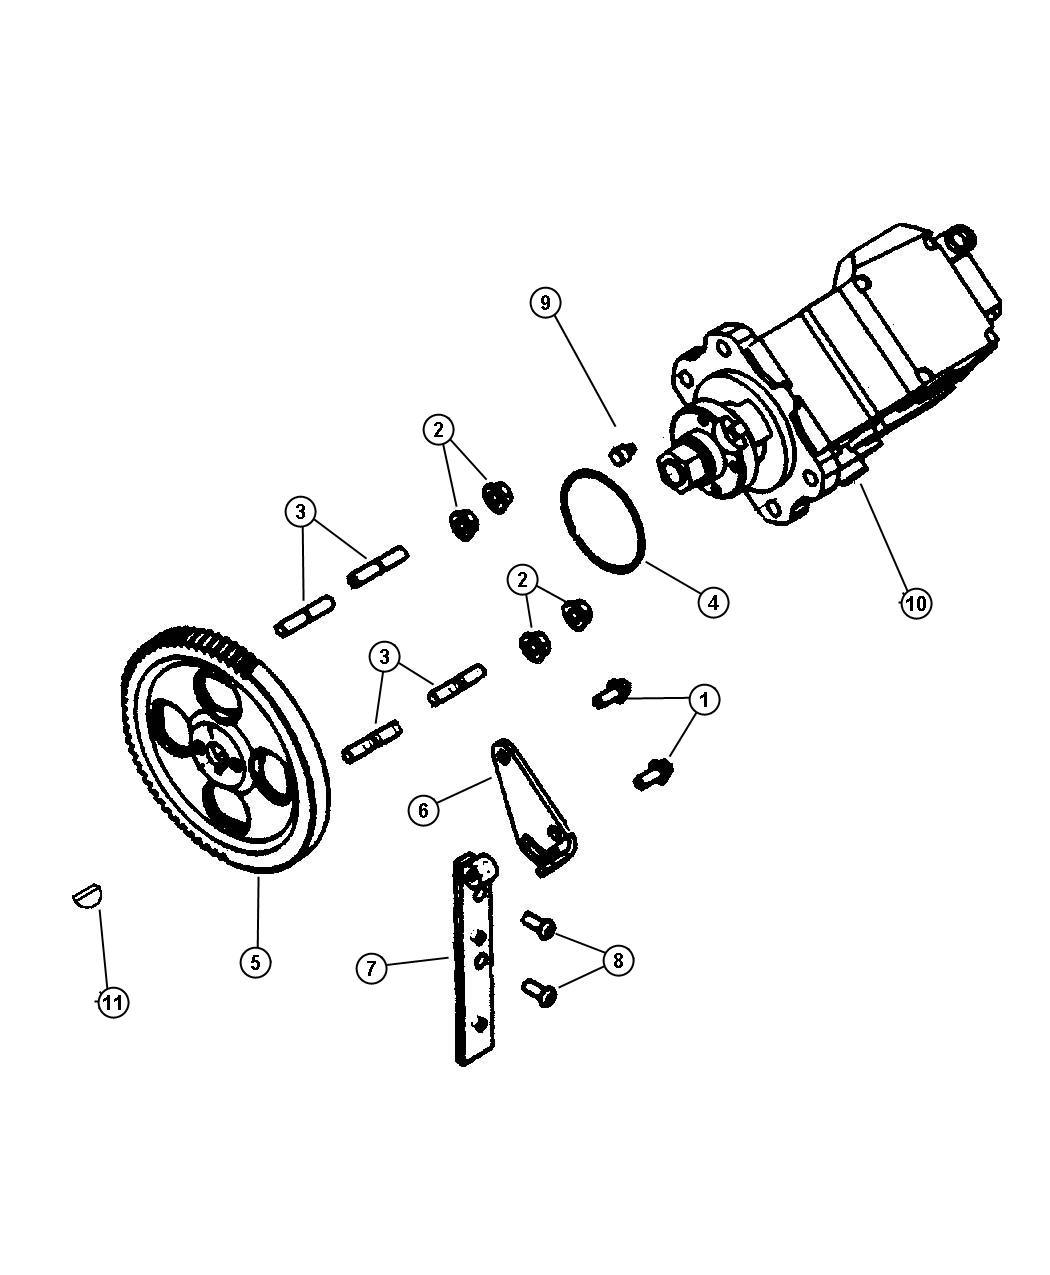 Dodge Ram 3500 Bolt. Hex head. Fuel pump mounting